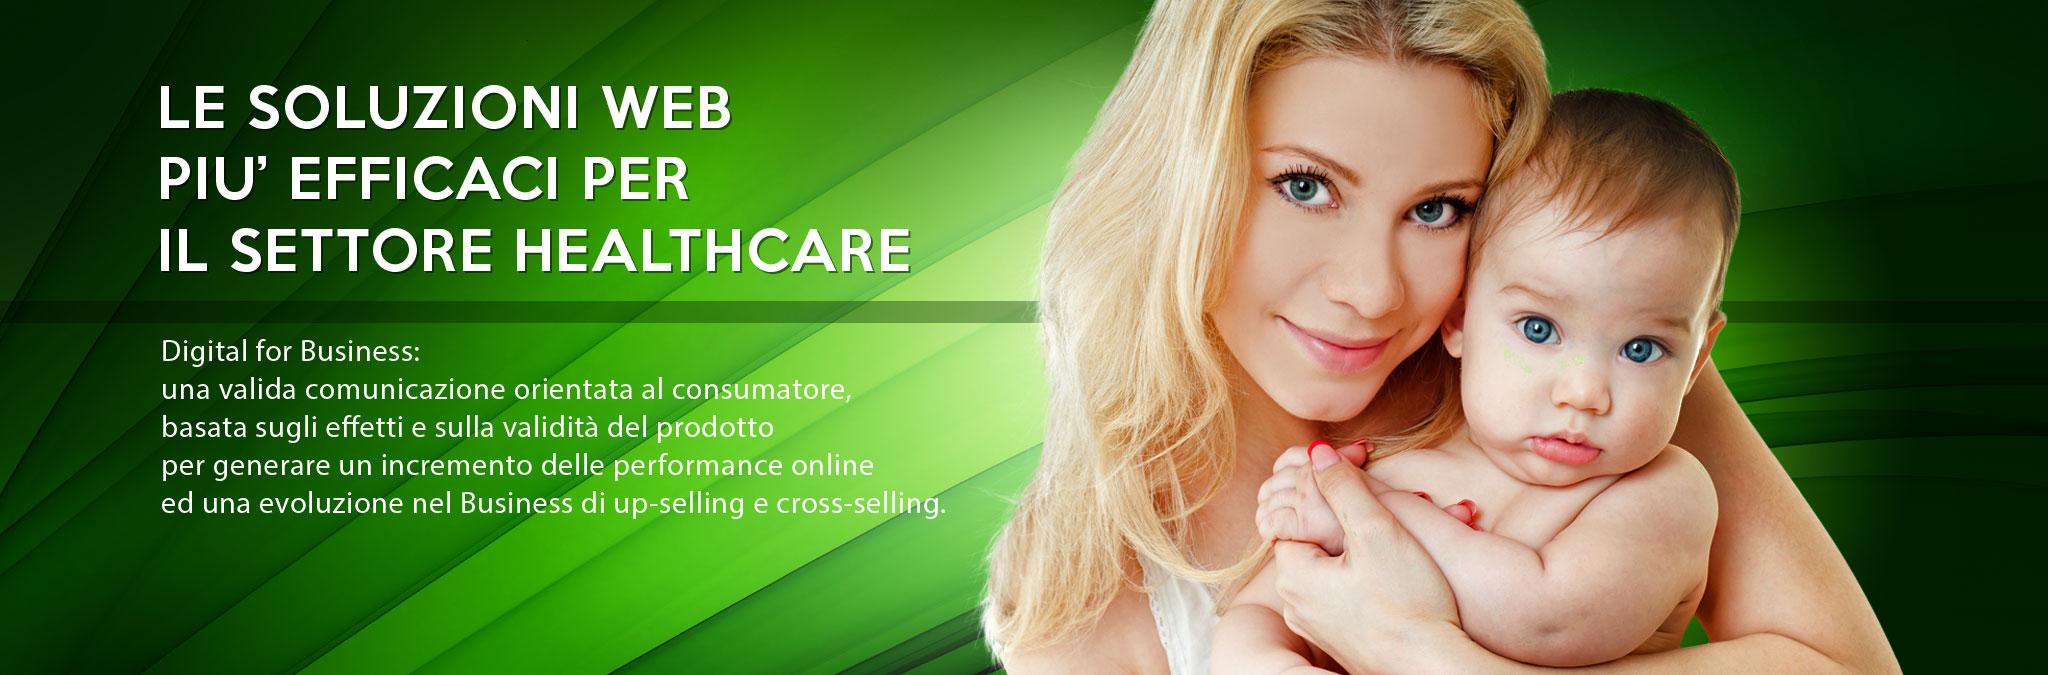 Digital for Business Healthcare